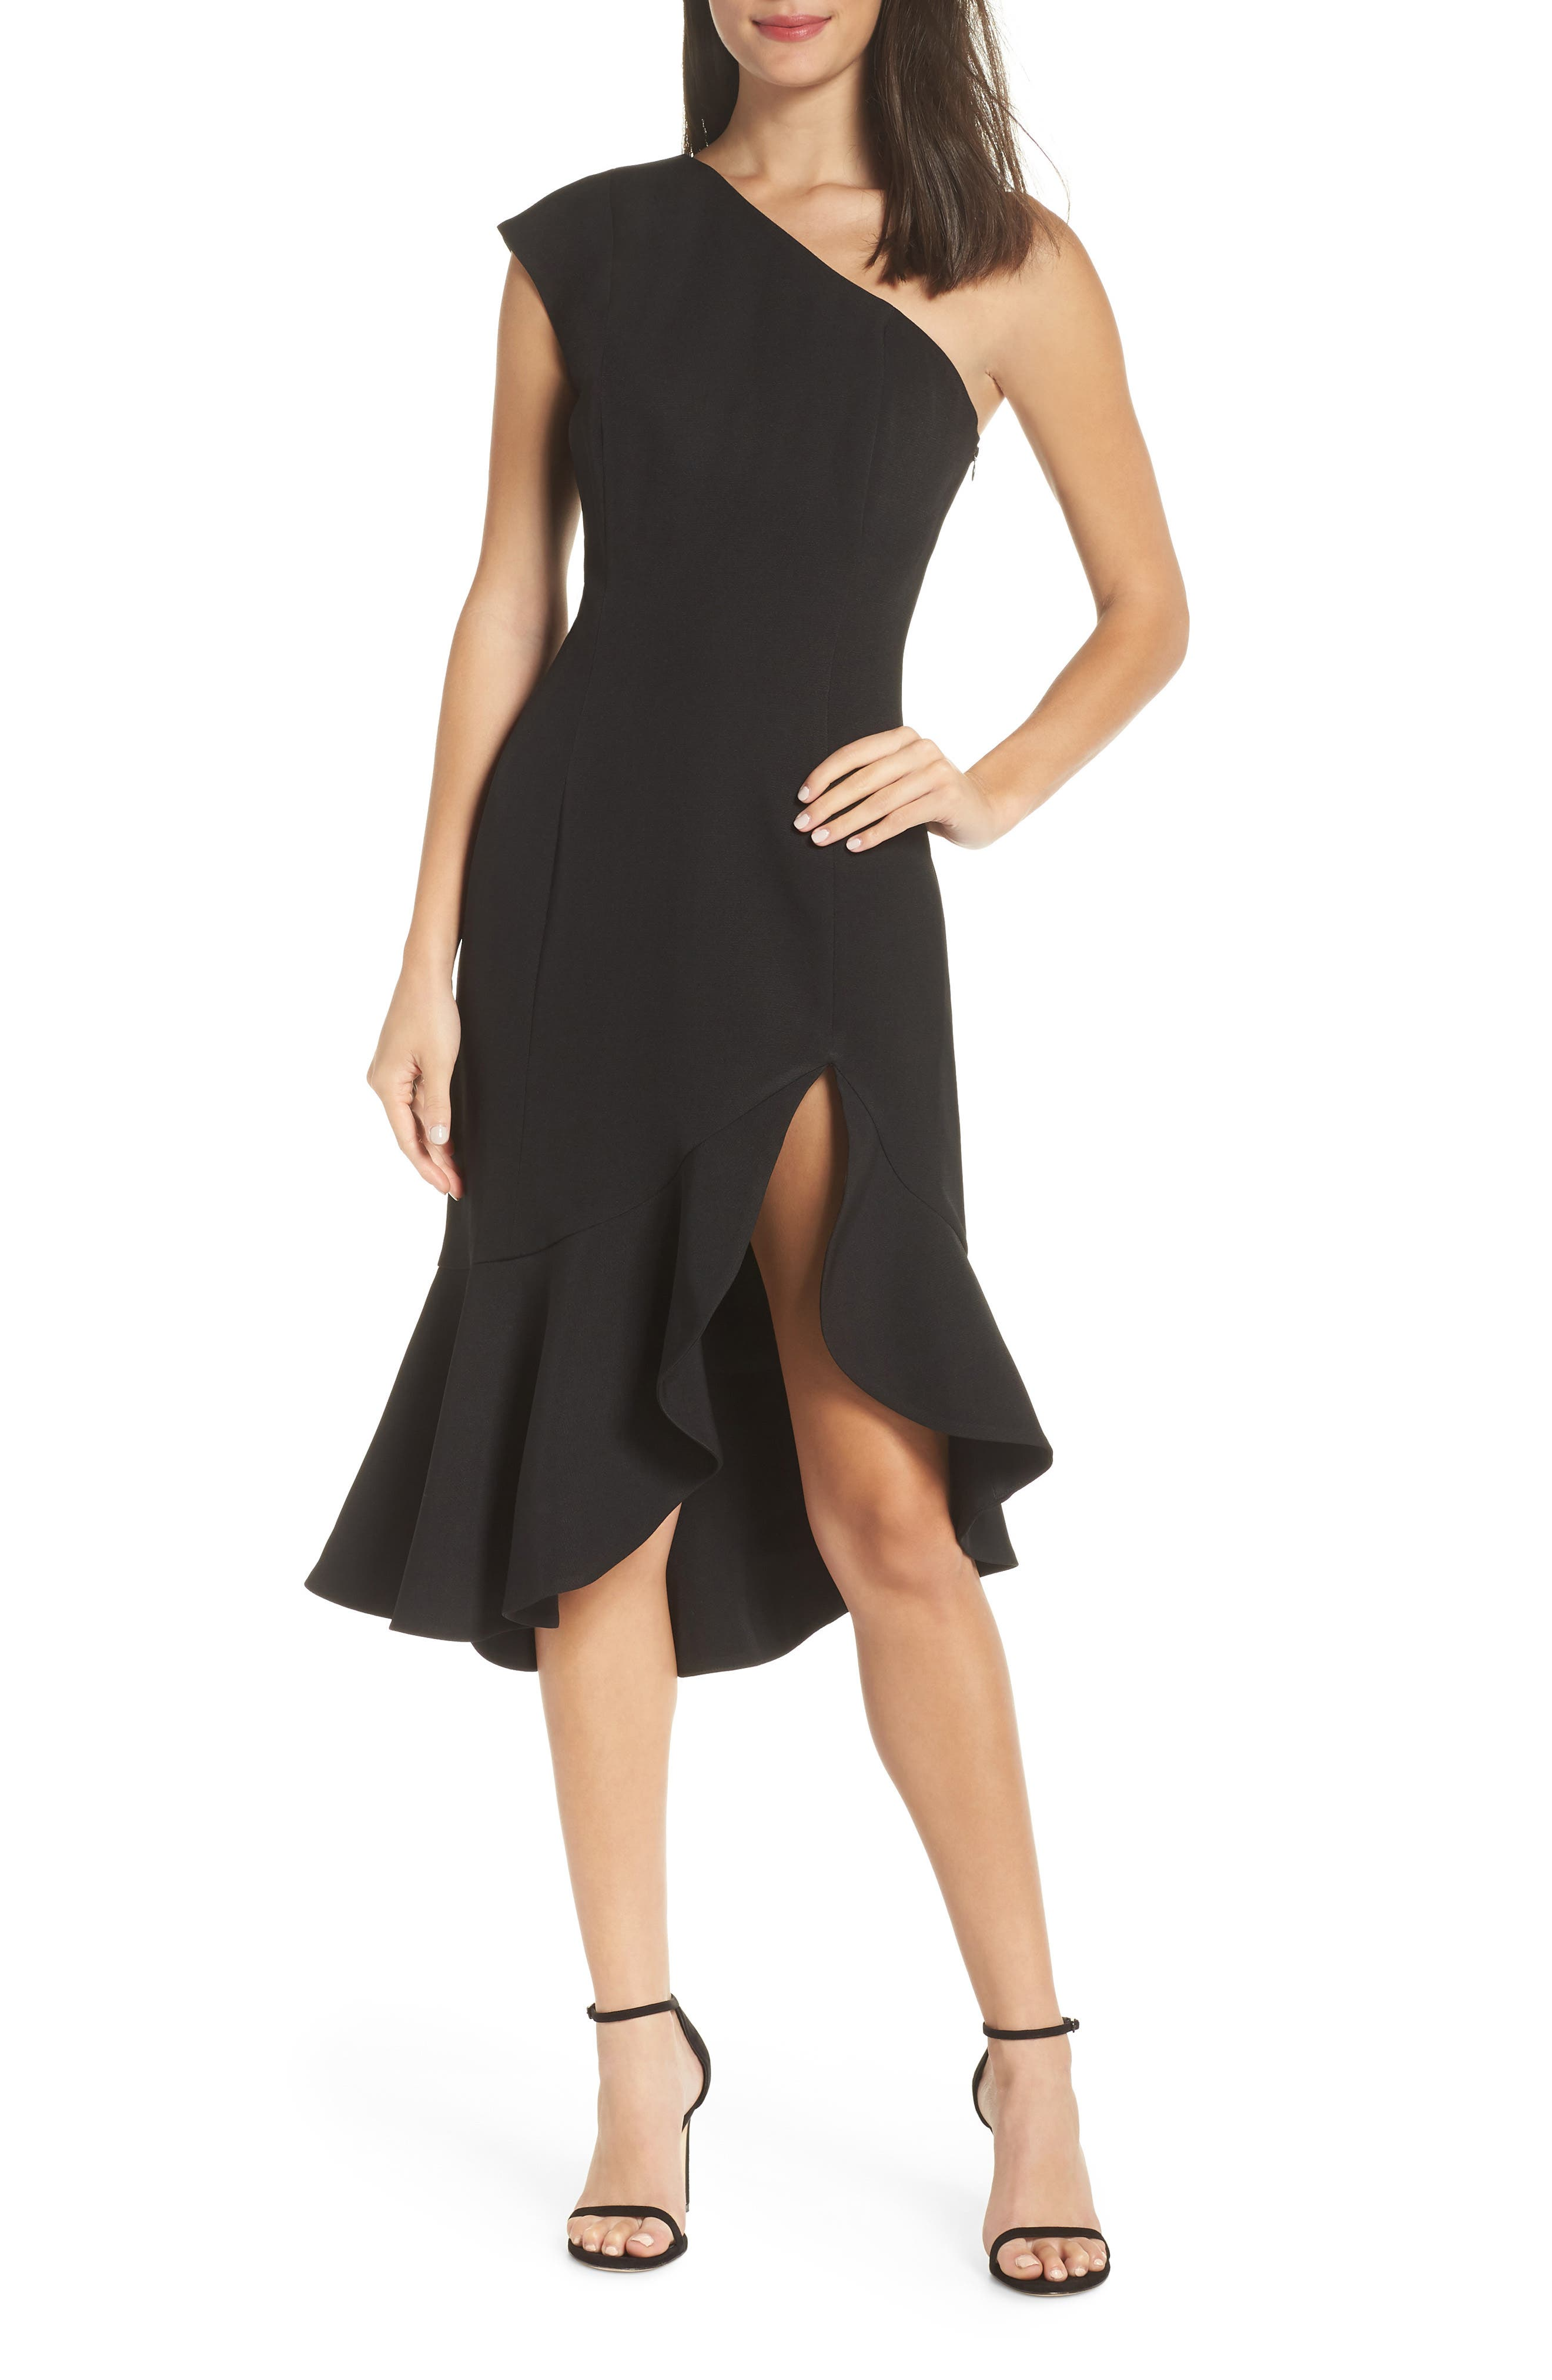 KEEPSAKE THE LABEL Mirrors One-Shoulder Asymmetrical Dress, Main, color, 001